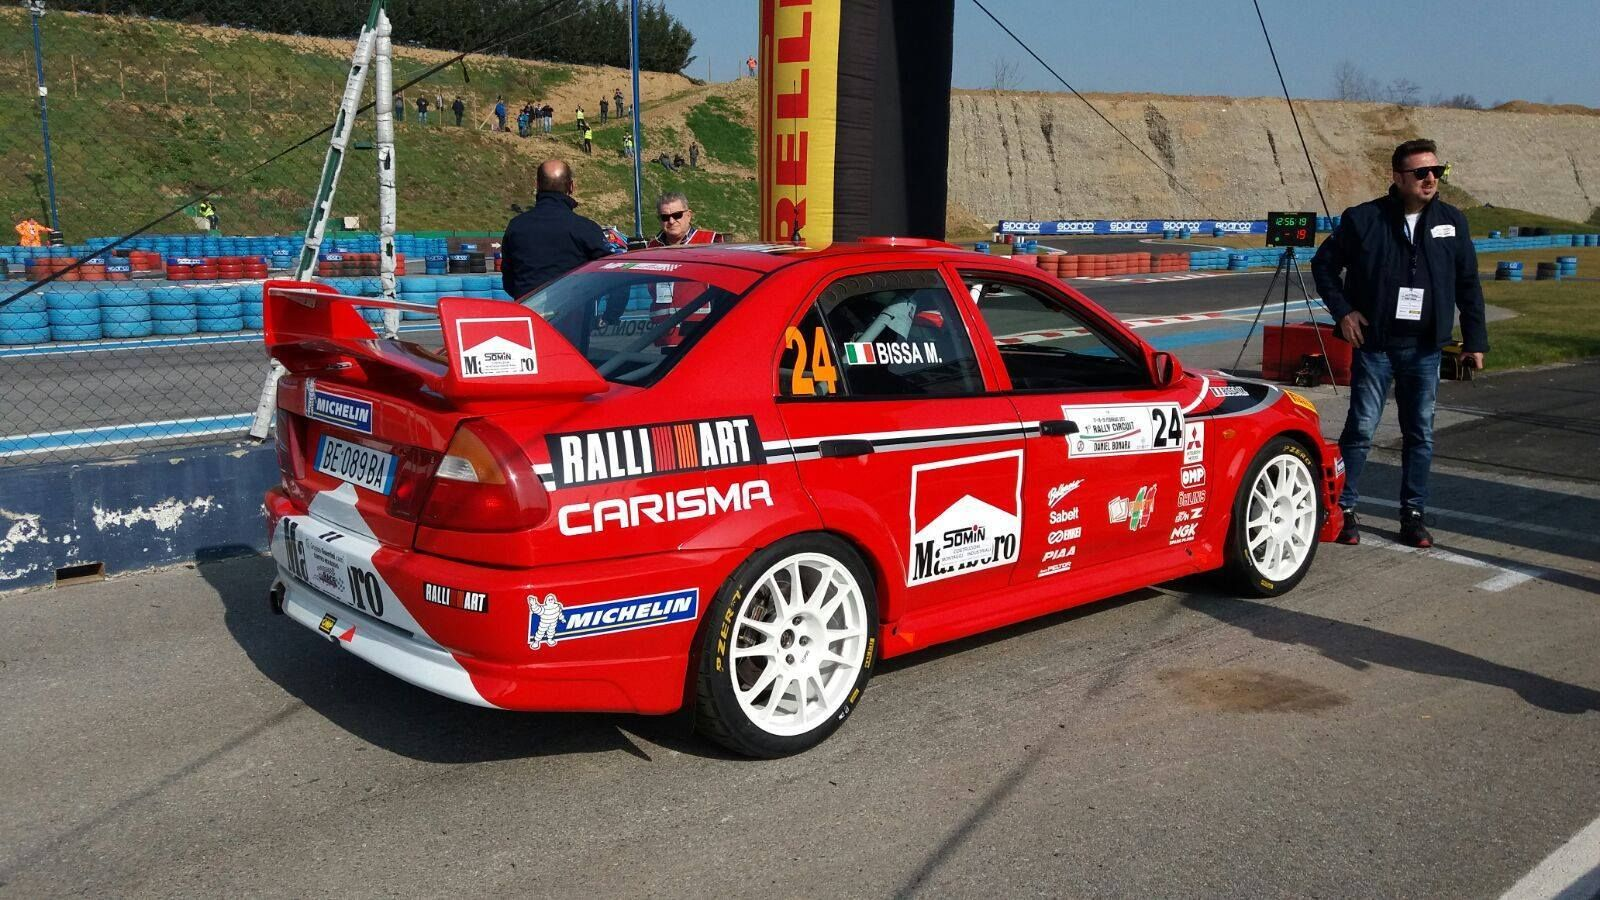 Rally Franciacorta 2017 Bissa With Mitsubishi Lancer Evocorse Racing Wheels Evocorse Racing Mitsubishi Lancer Evolution Mitsubishi Lancer Mitsubishi Evo